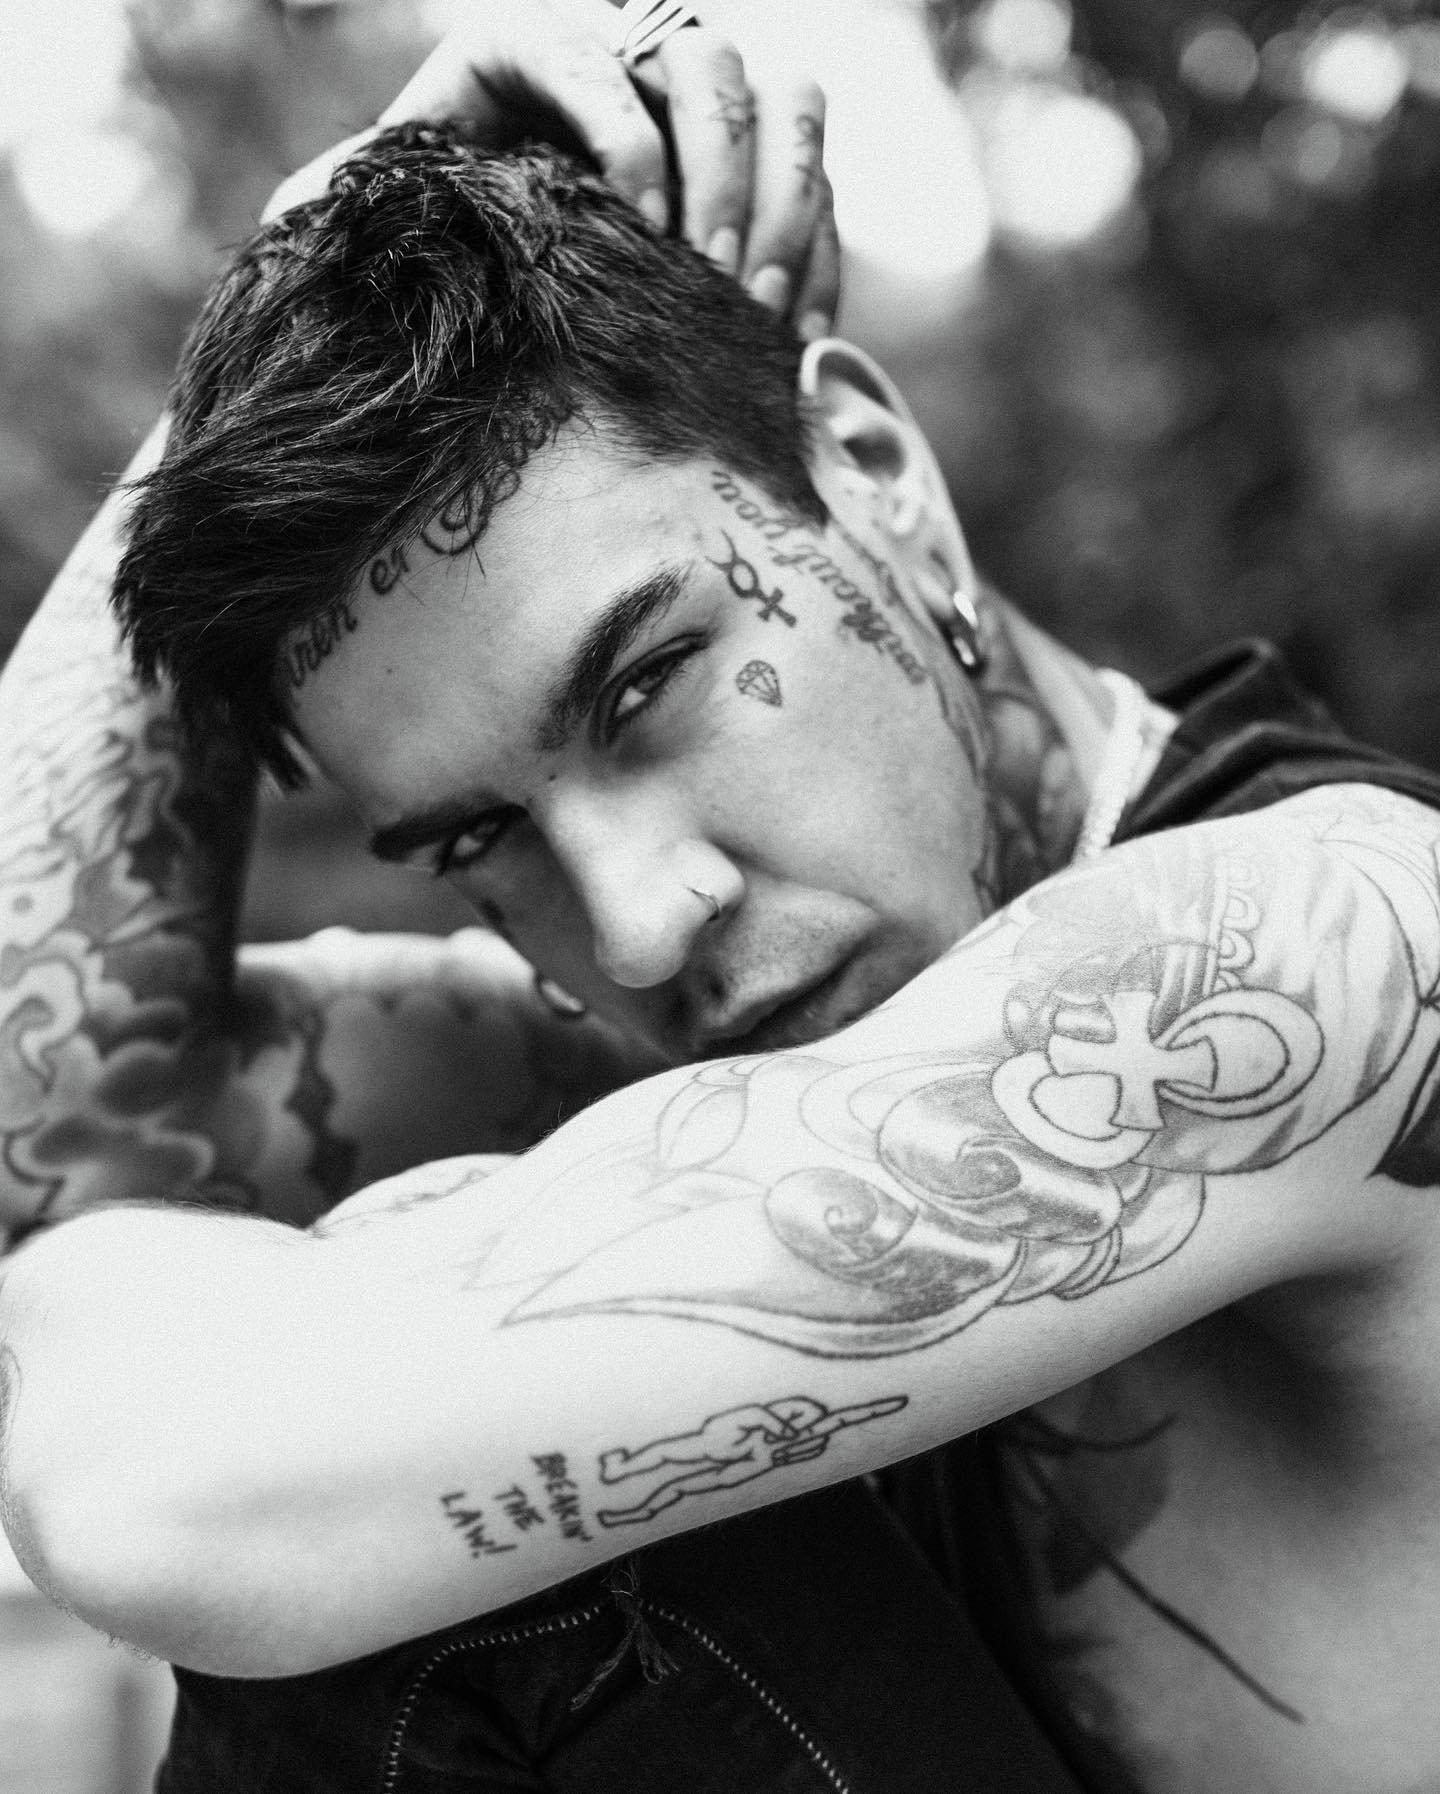 the vulnerability in tattoos